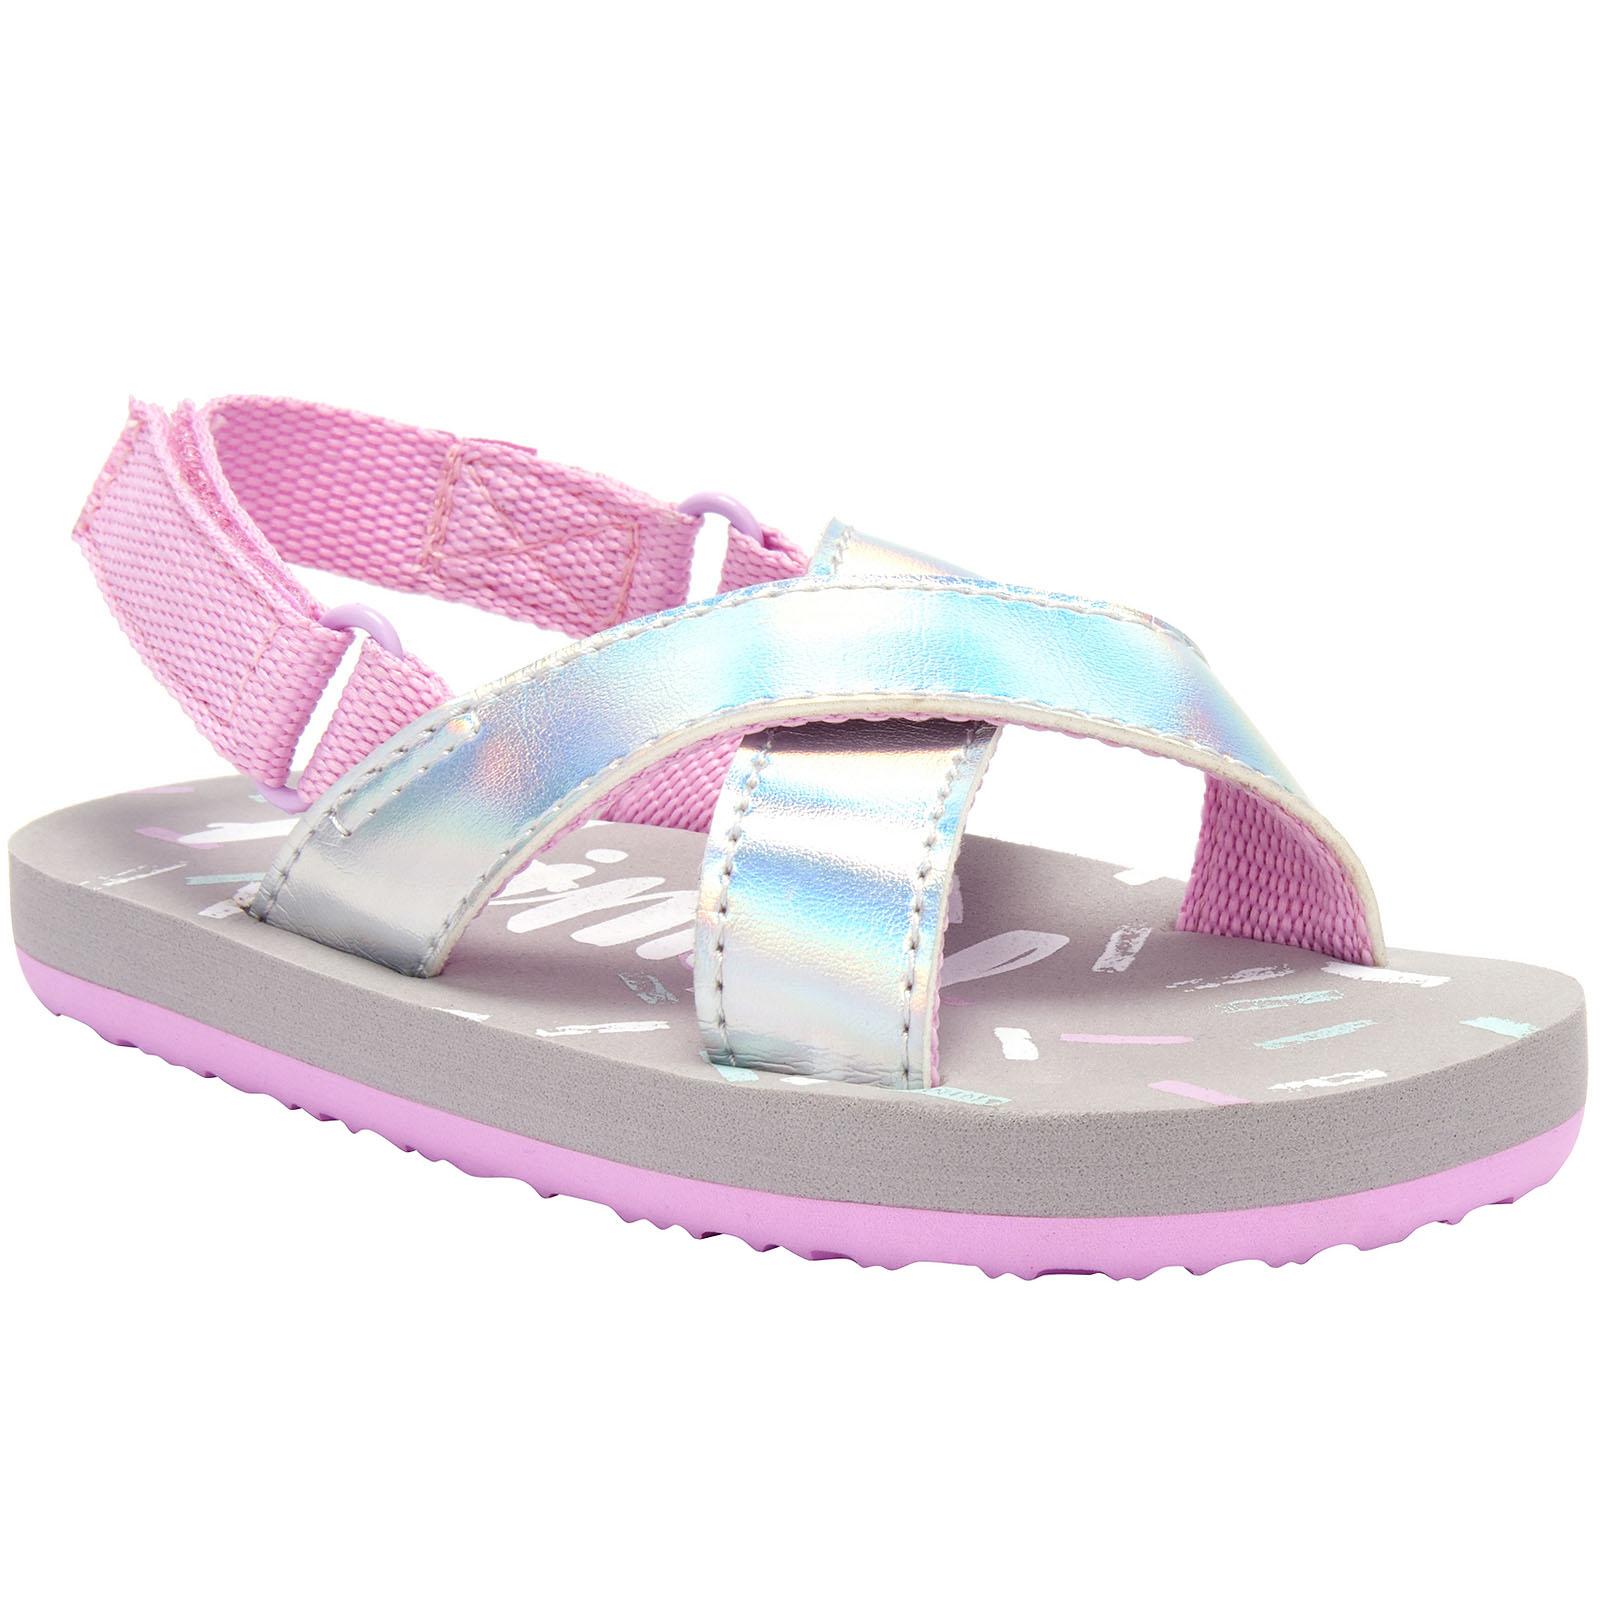 Animal-Girls-Daisie-Kids-Childrens-Beach-Summer-Holiday-Slip-On-Thongs-Sandals miniature 3